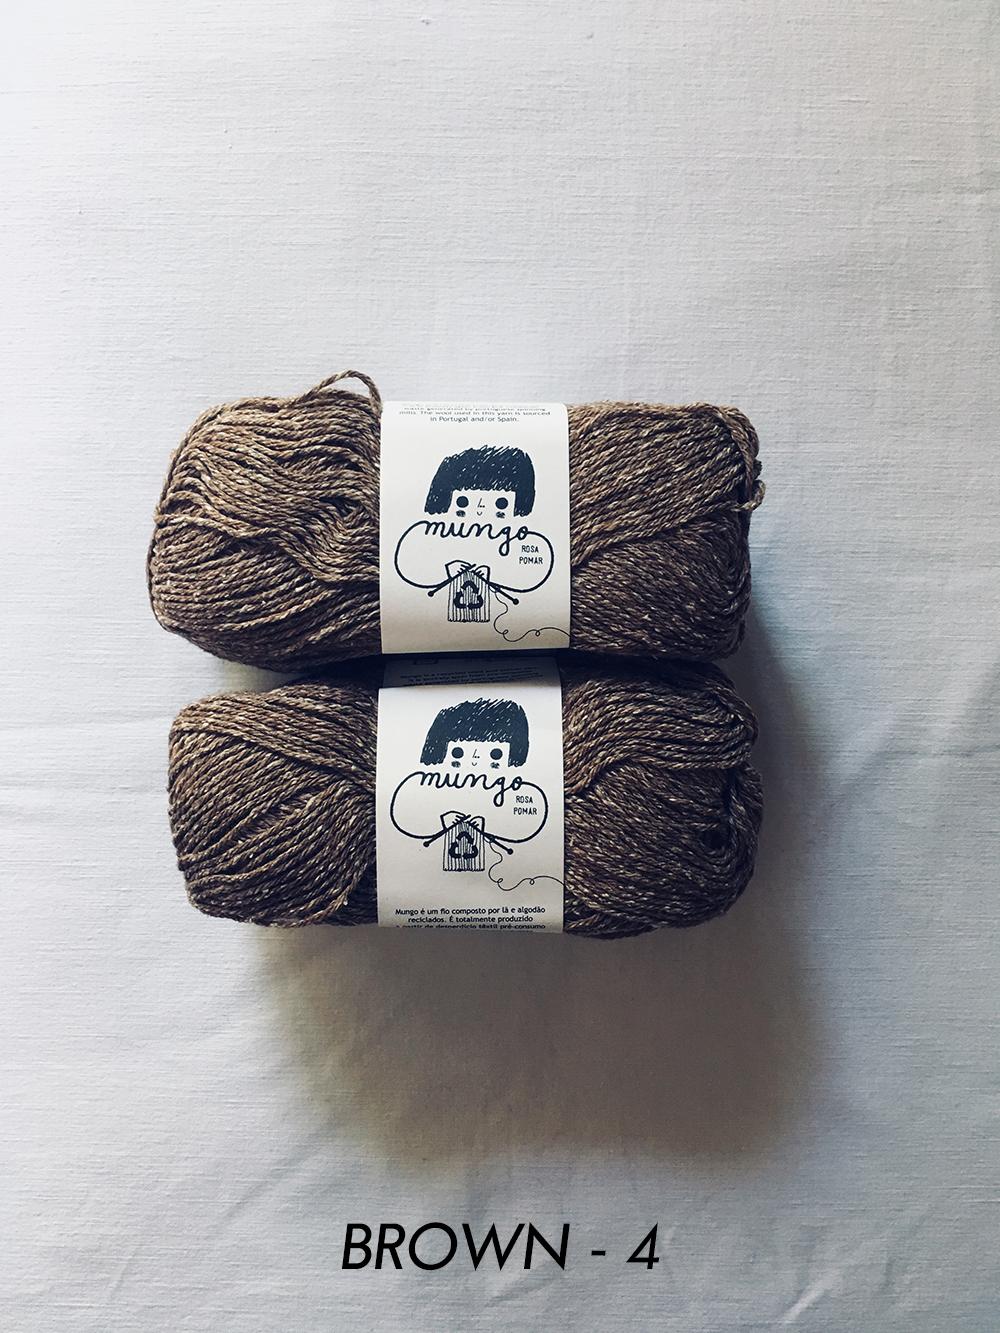 retrosaria_mungo_4_wool_done_knitting.jpg